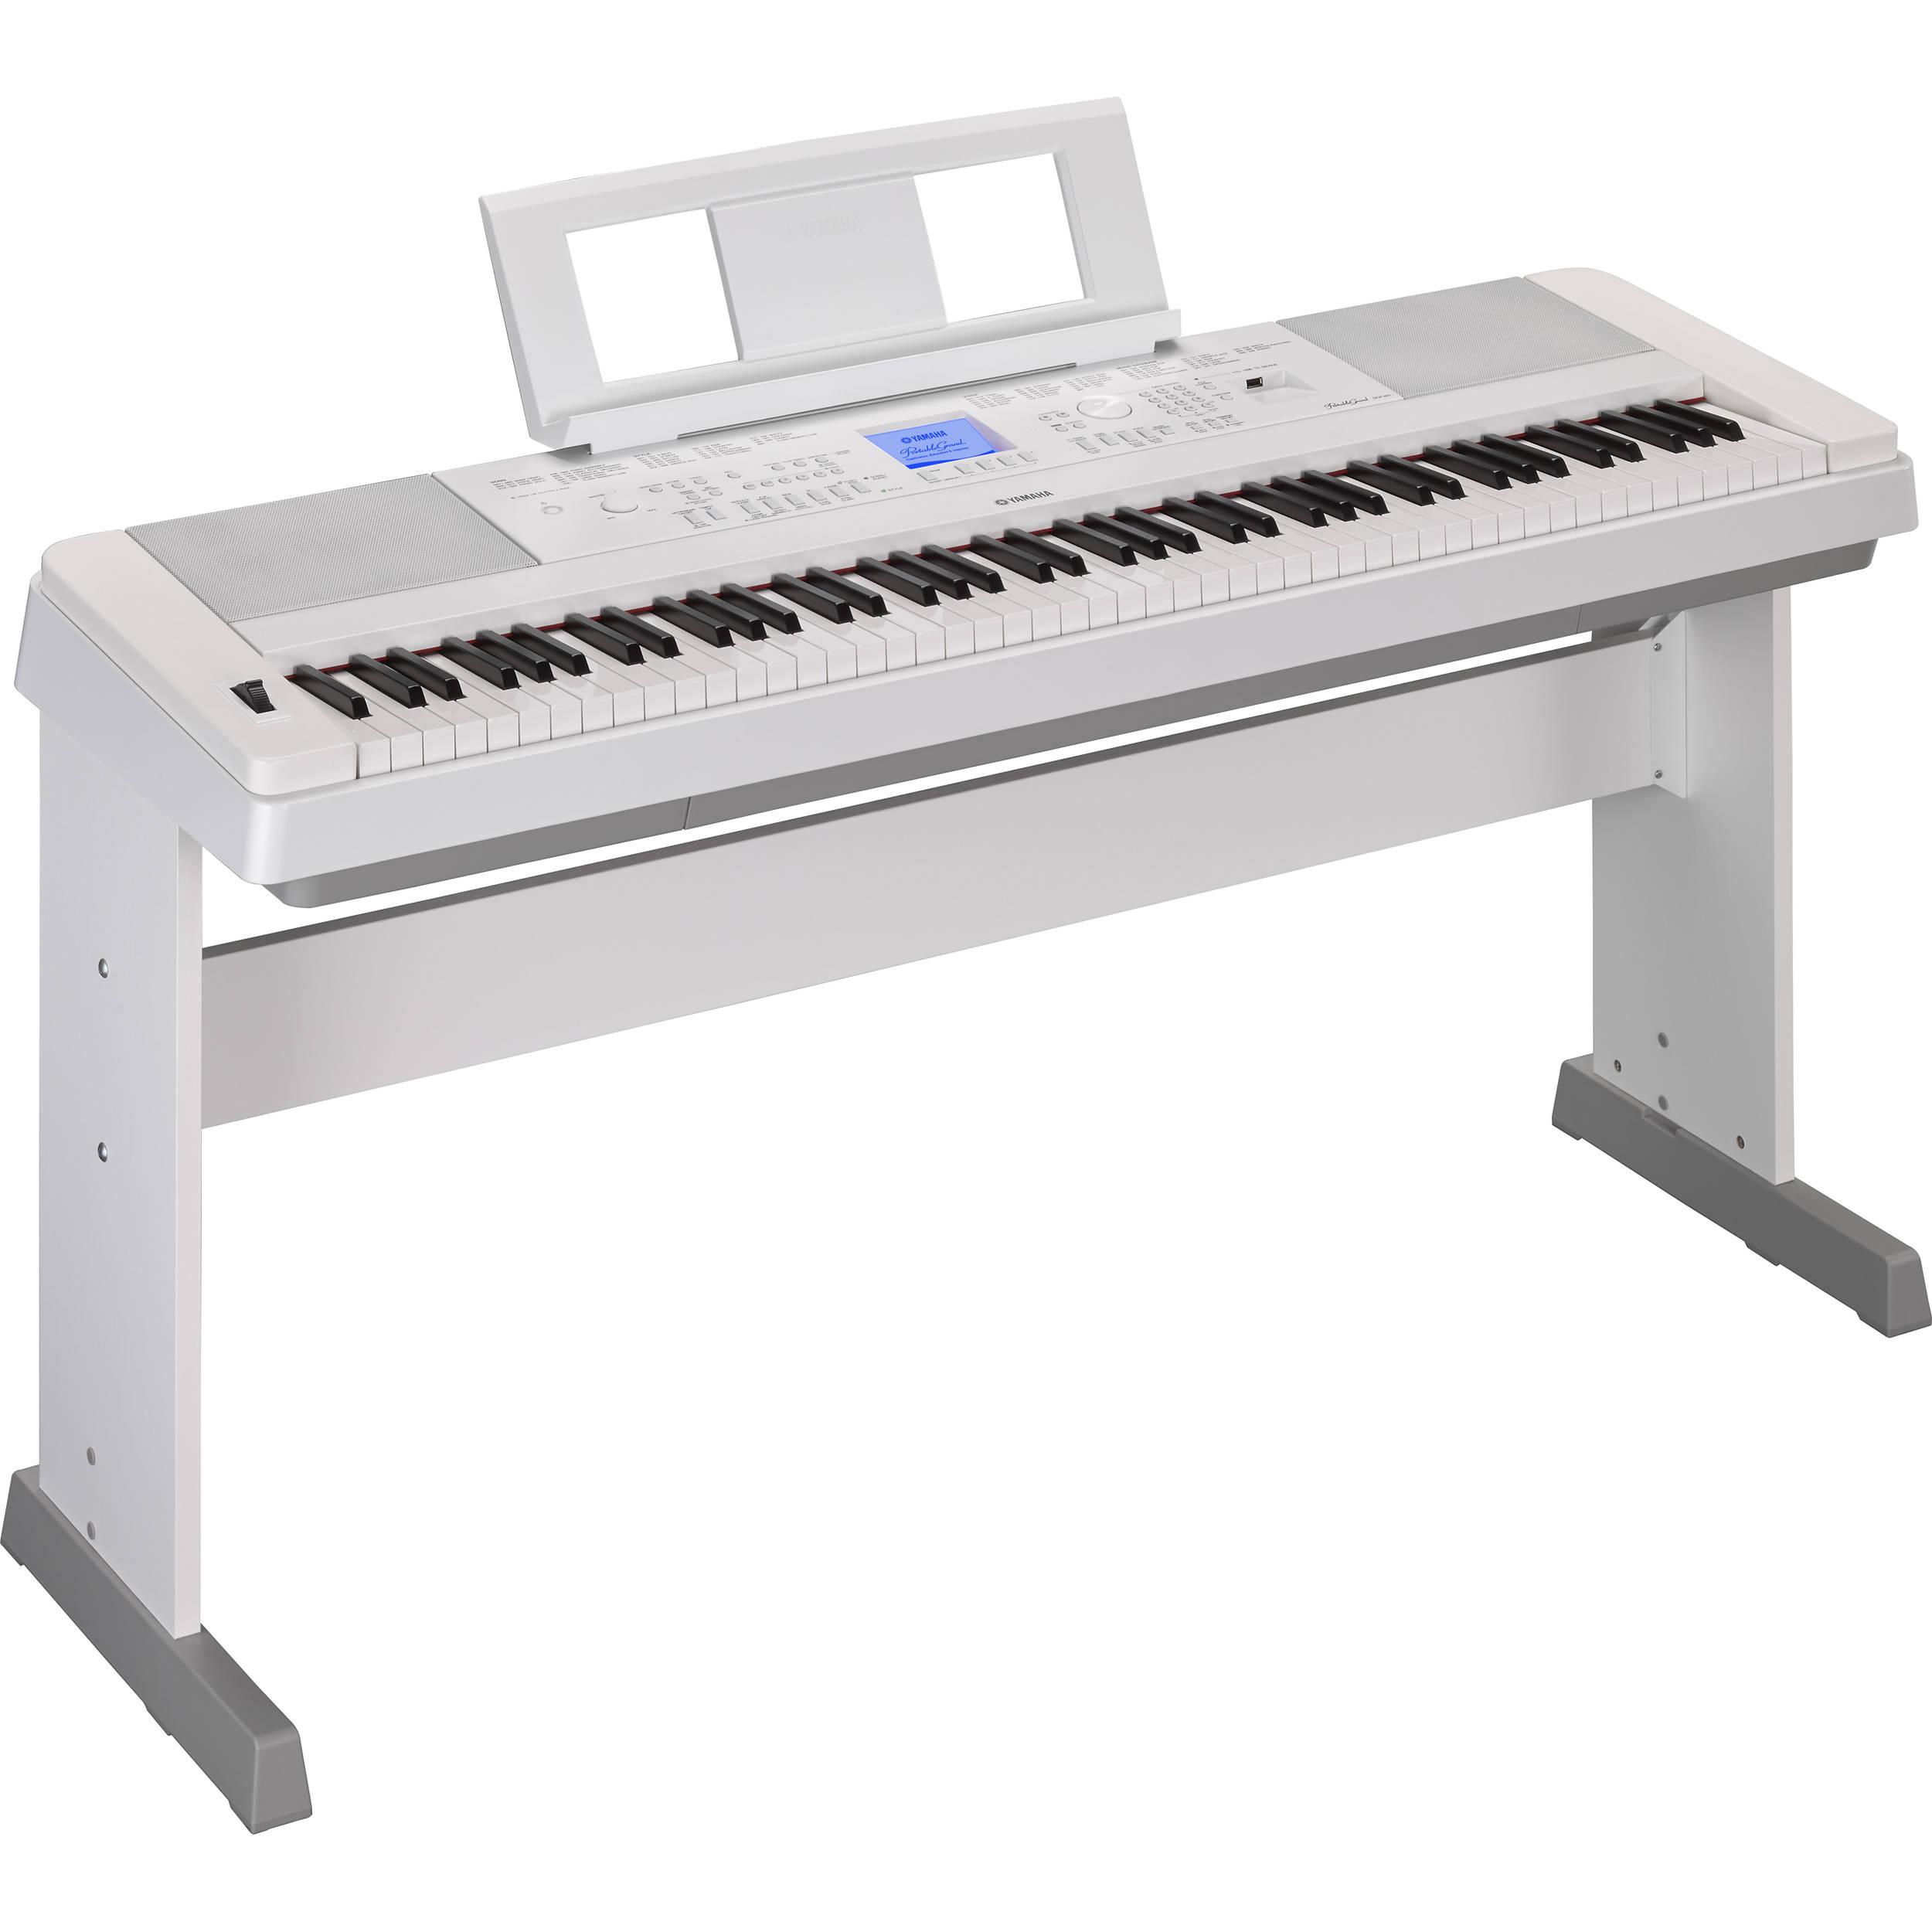 yamaha dgx 660 portable grand digital piano white dgx660wh. Black Bedroom Furniture Sets. Home Design Ideas